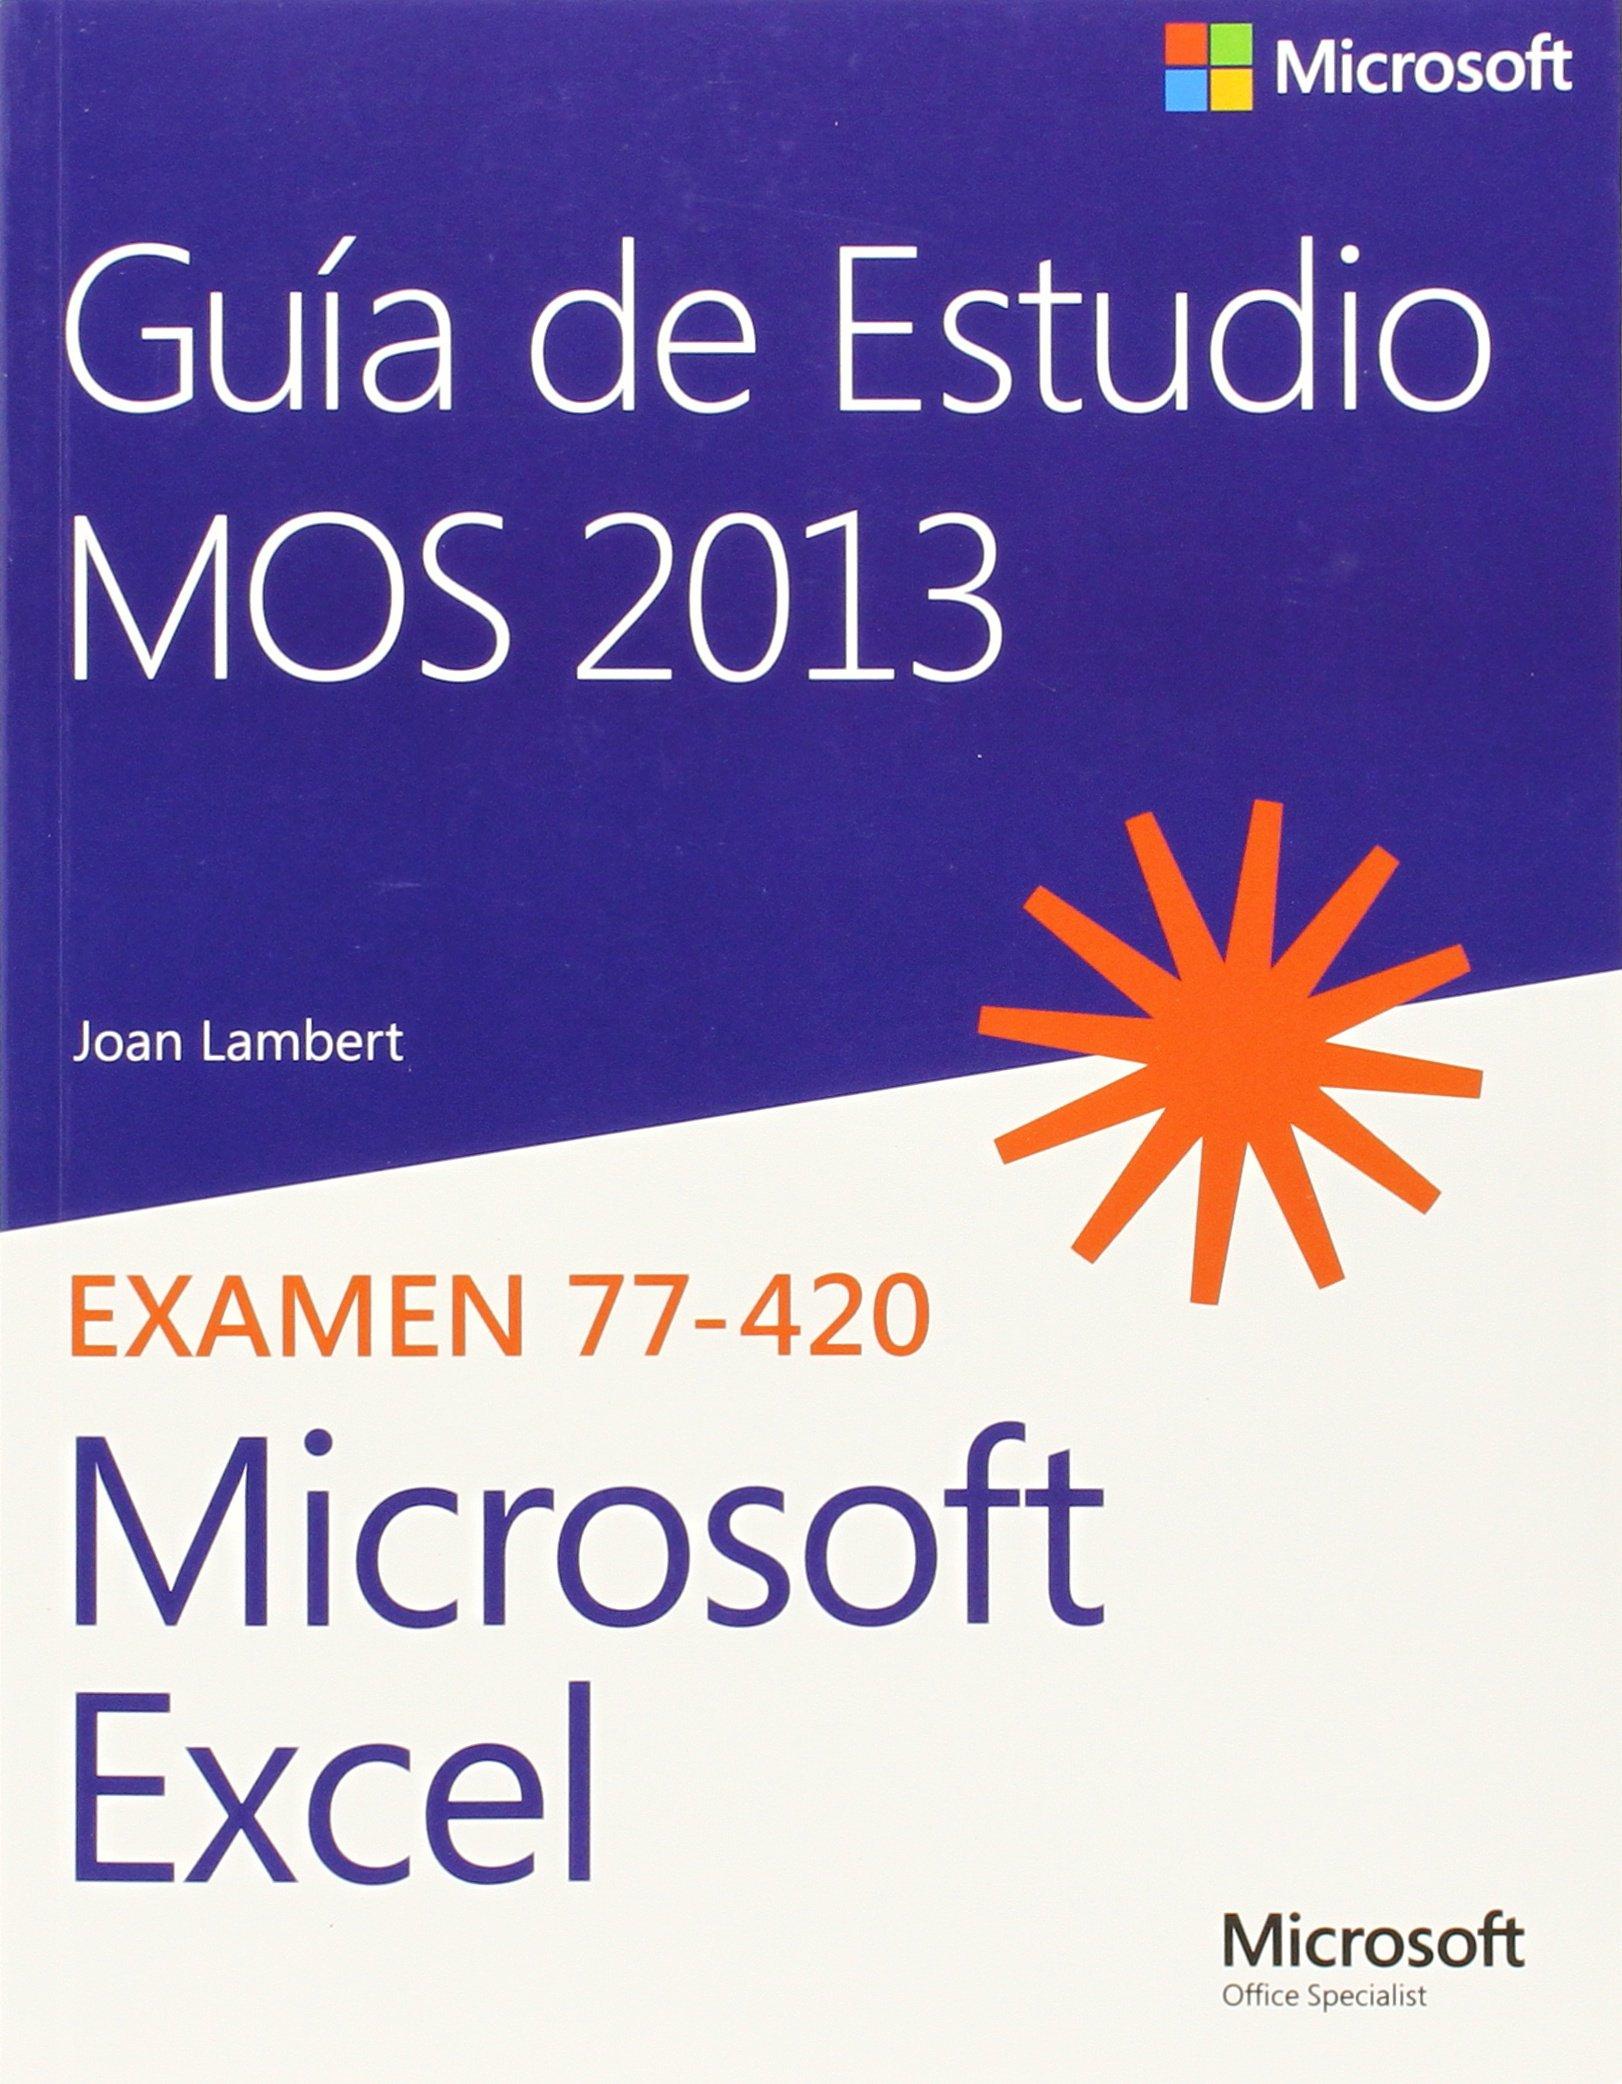 Guía de estudio MOS 2013 para Microsoft Excel : examen 77-420 Tapa blanda – 1 ago 2014 Joan Lambert Anaya Multimedia 8441536120 Spanish: Adult Nonfiction